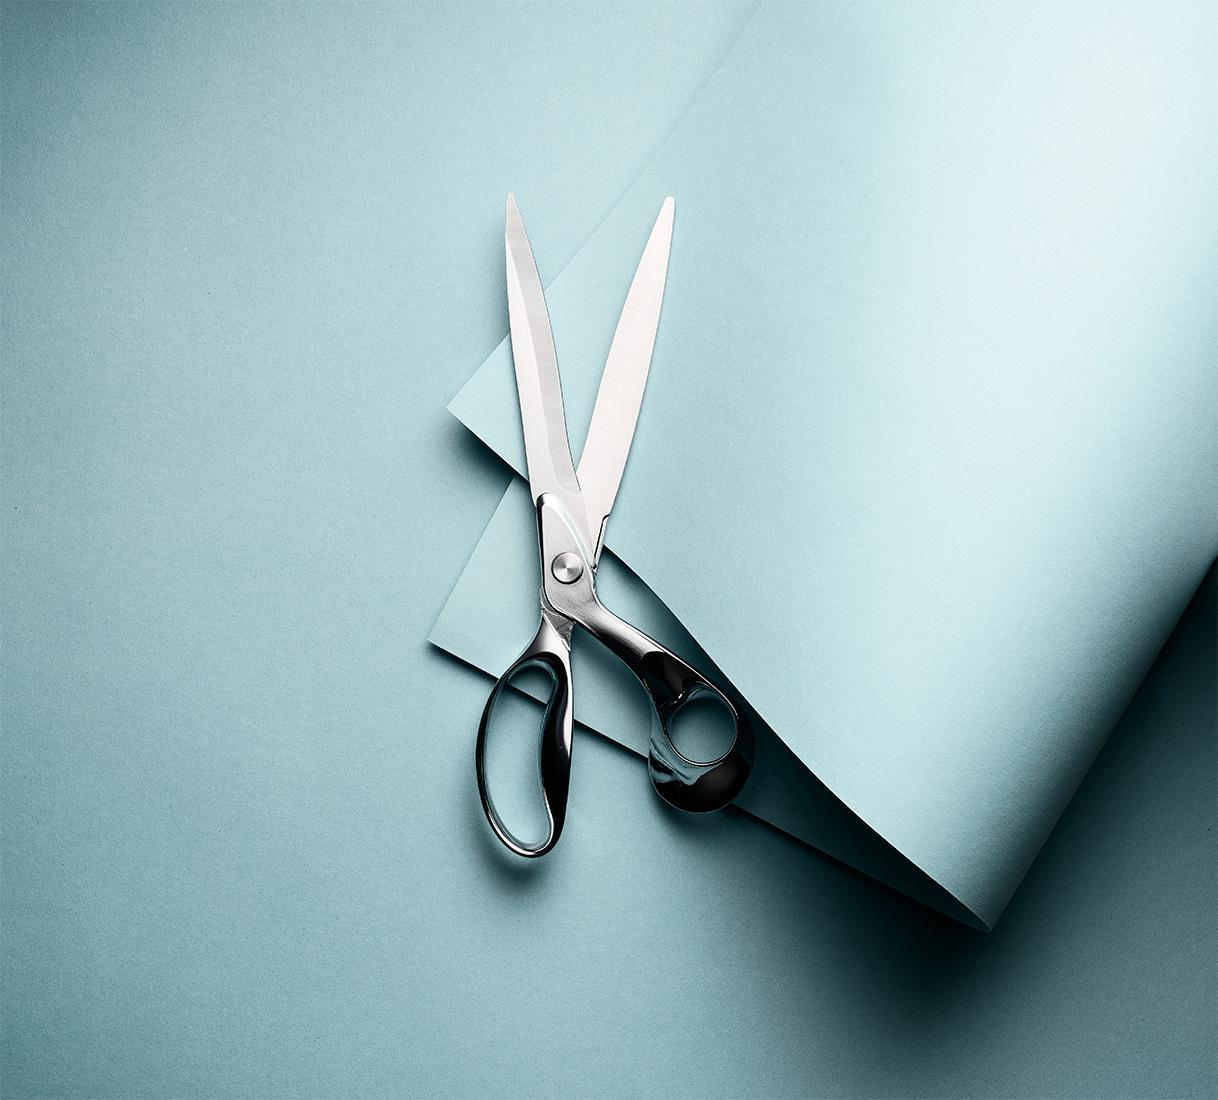 Personal work   Scissors